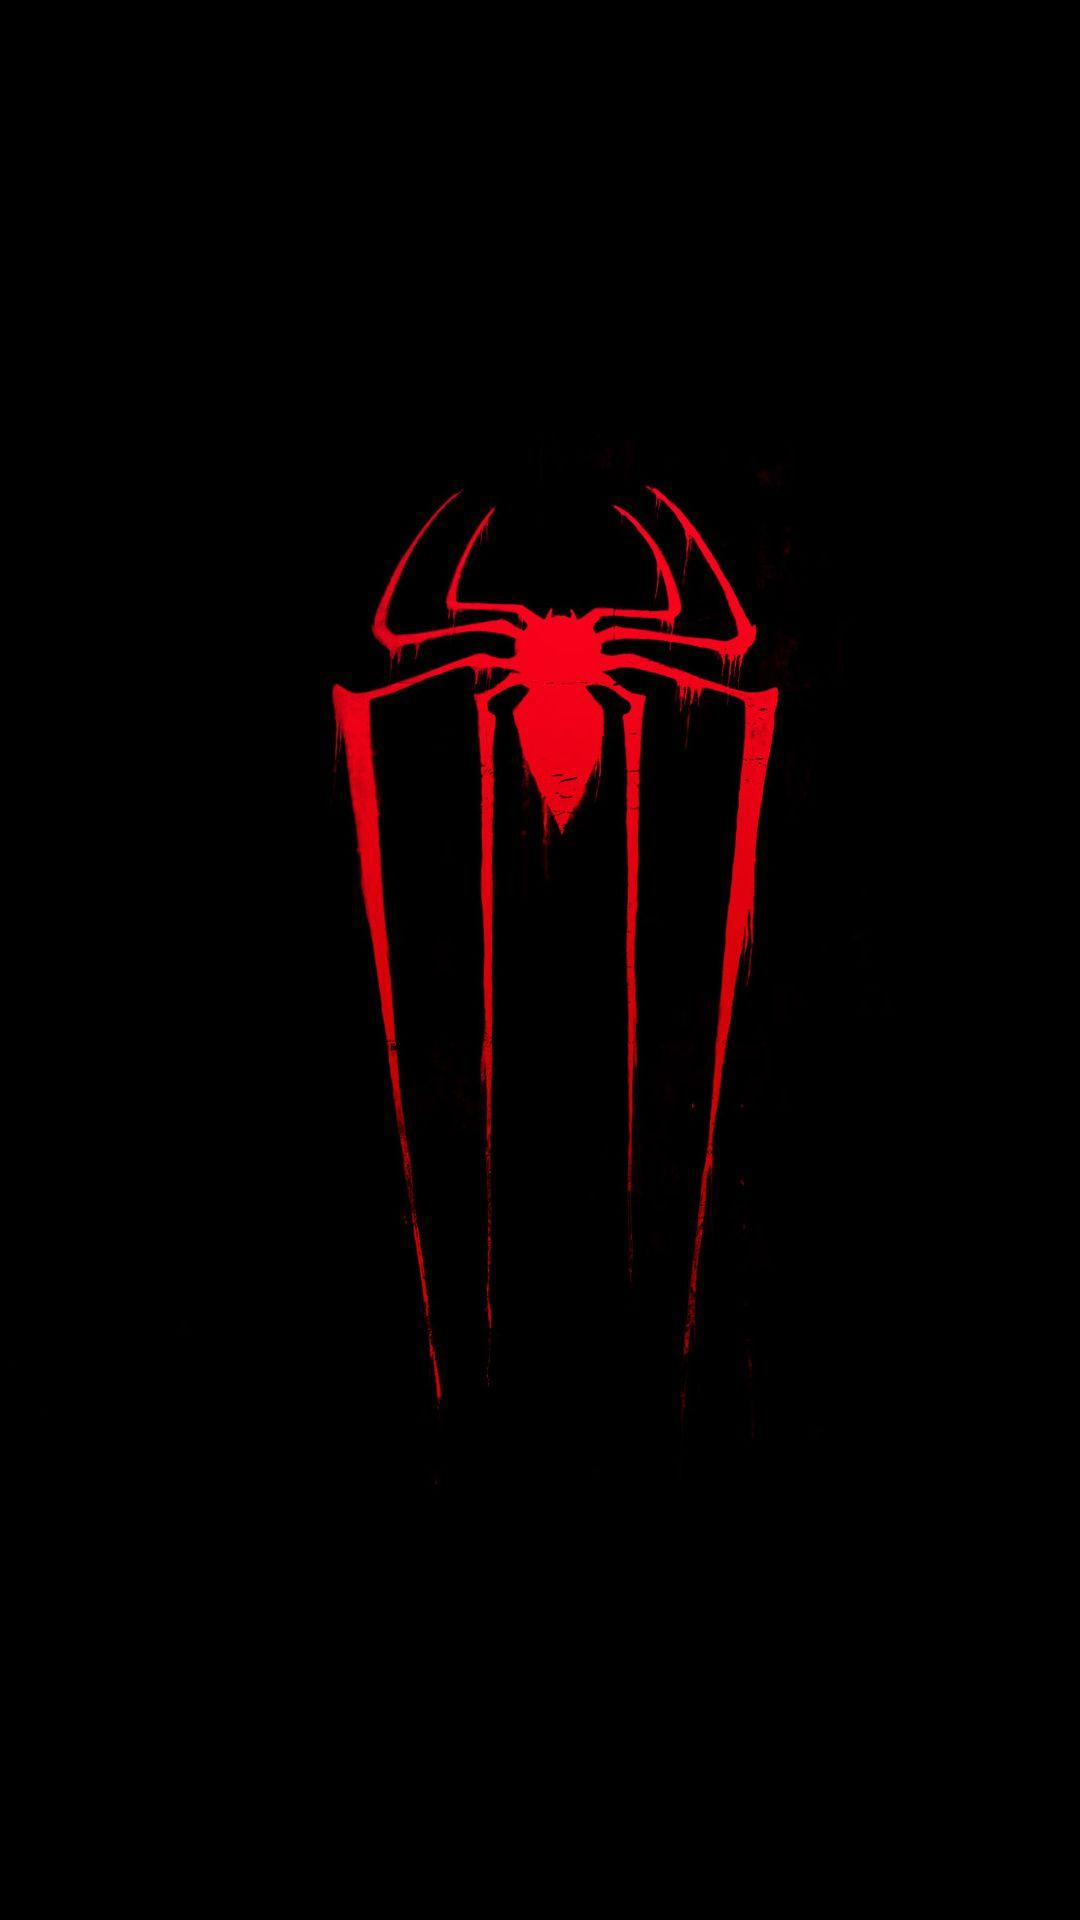 Most Inspiring Wallpaper Home Screen Spiderman - 3b890476b8c8296de180d07ebc13e21d  Trends_711320.jpg